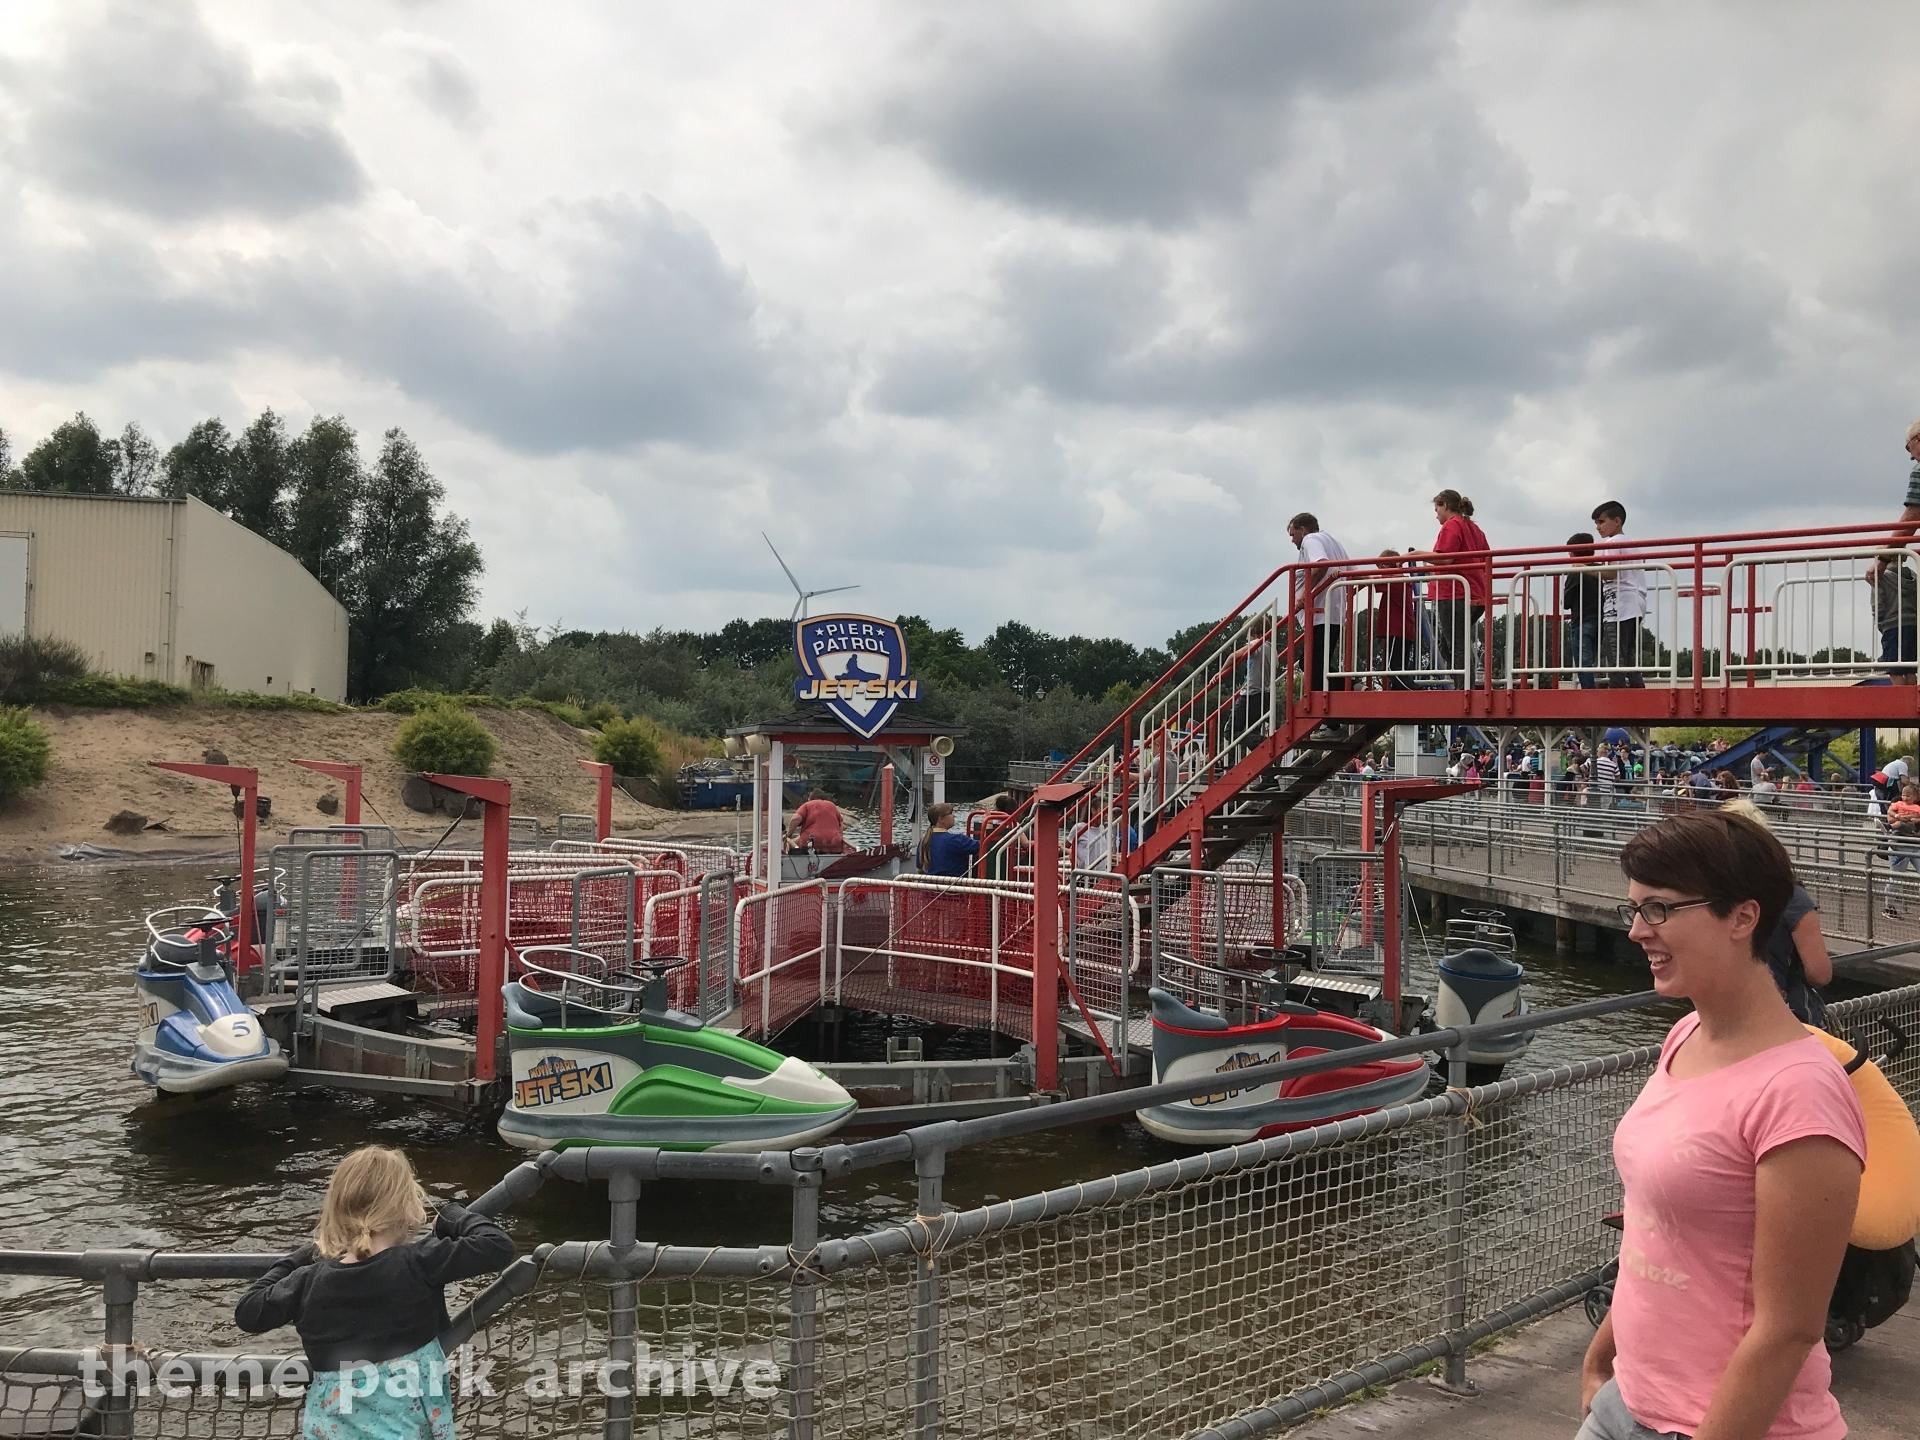 Pier Patrol Jet Ski at Movie Park Germany